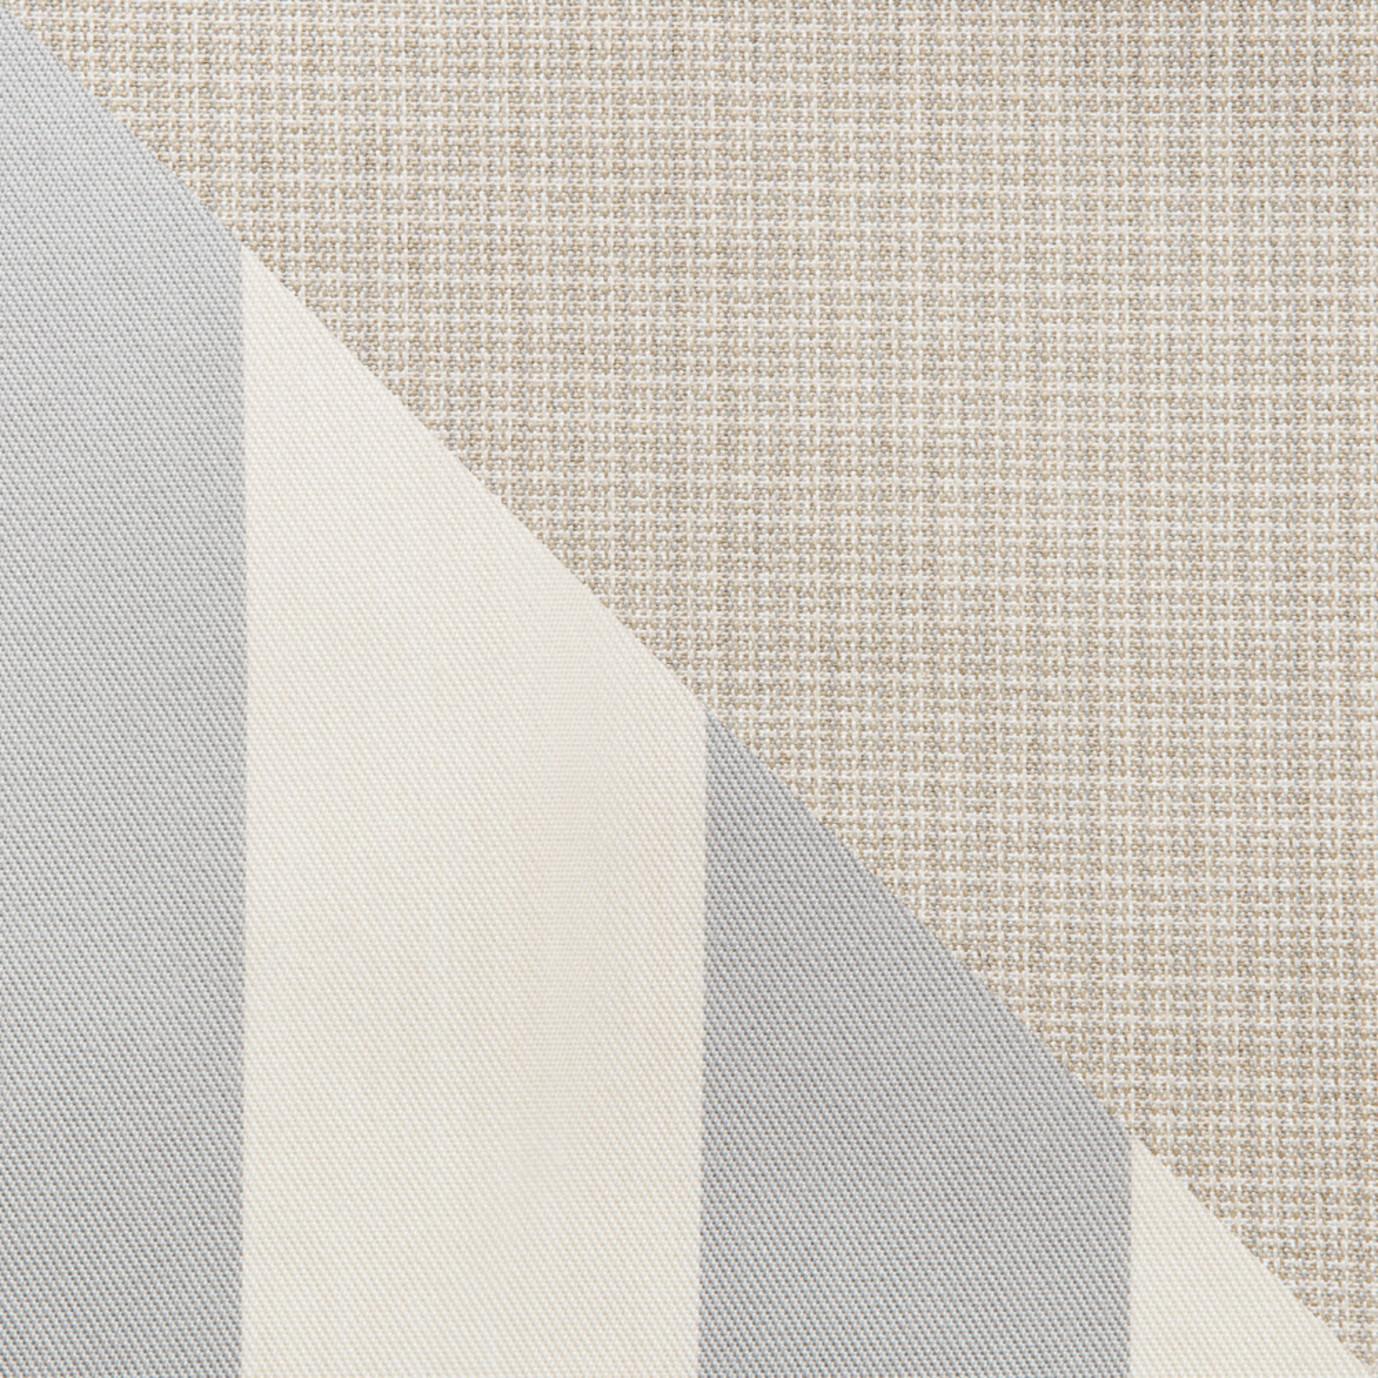 Deco™ Sofa - Slate Gray